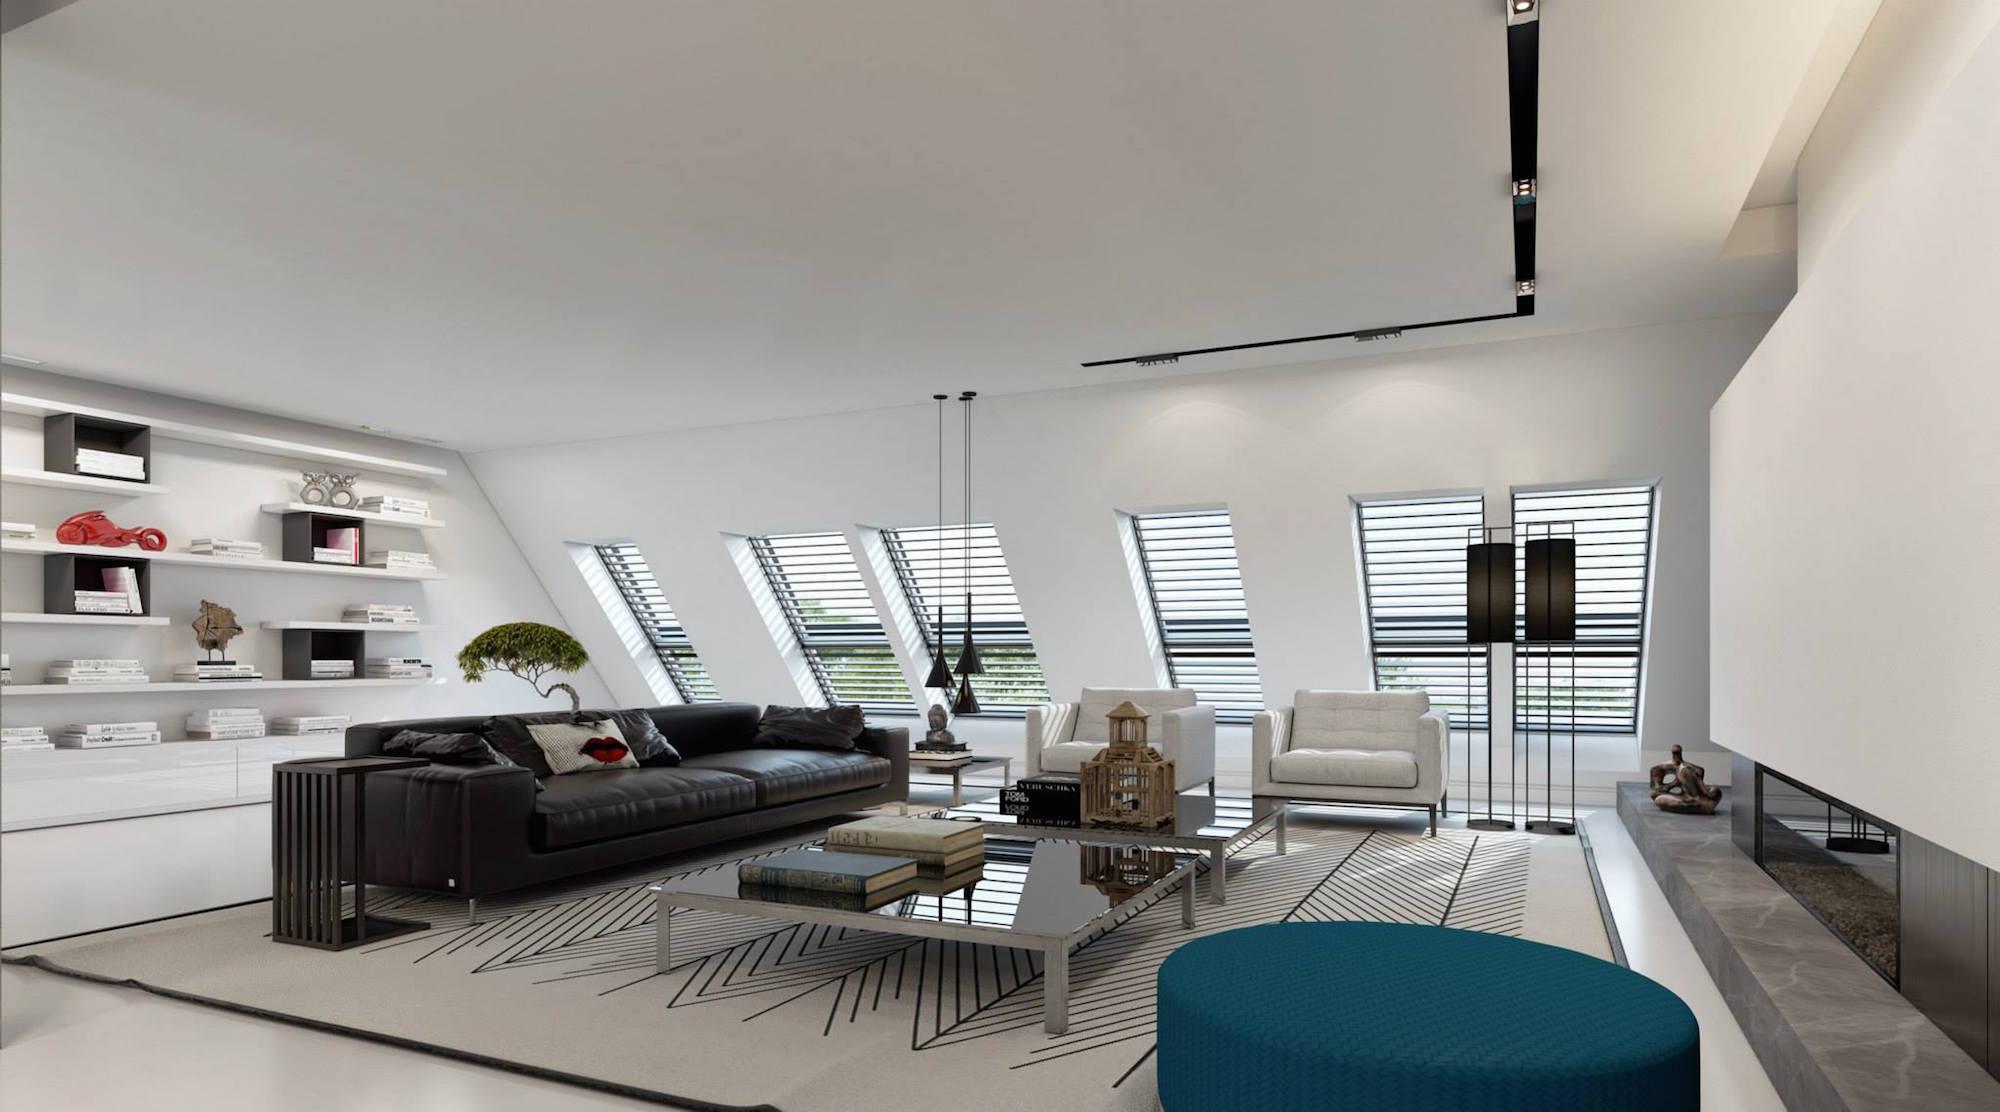 finished attic storage ideas - Ultramodern Dusseldorf Penthouse Design by Ando Studio